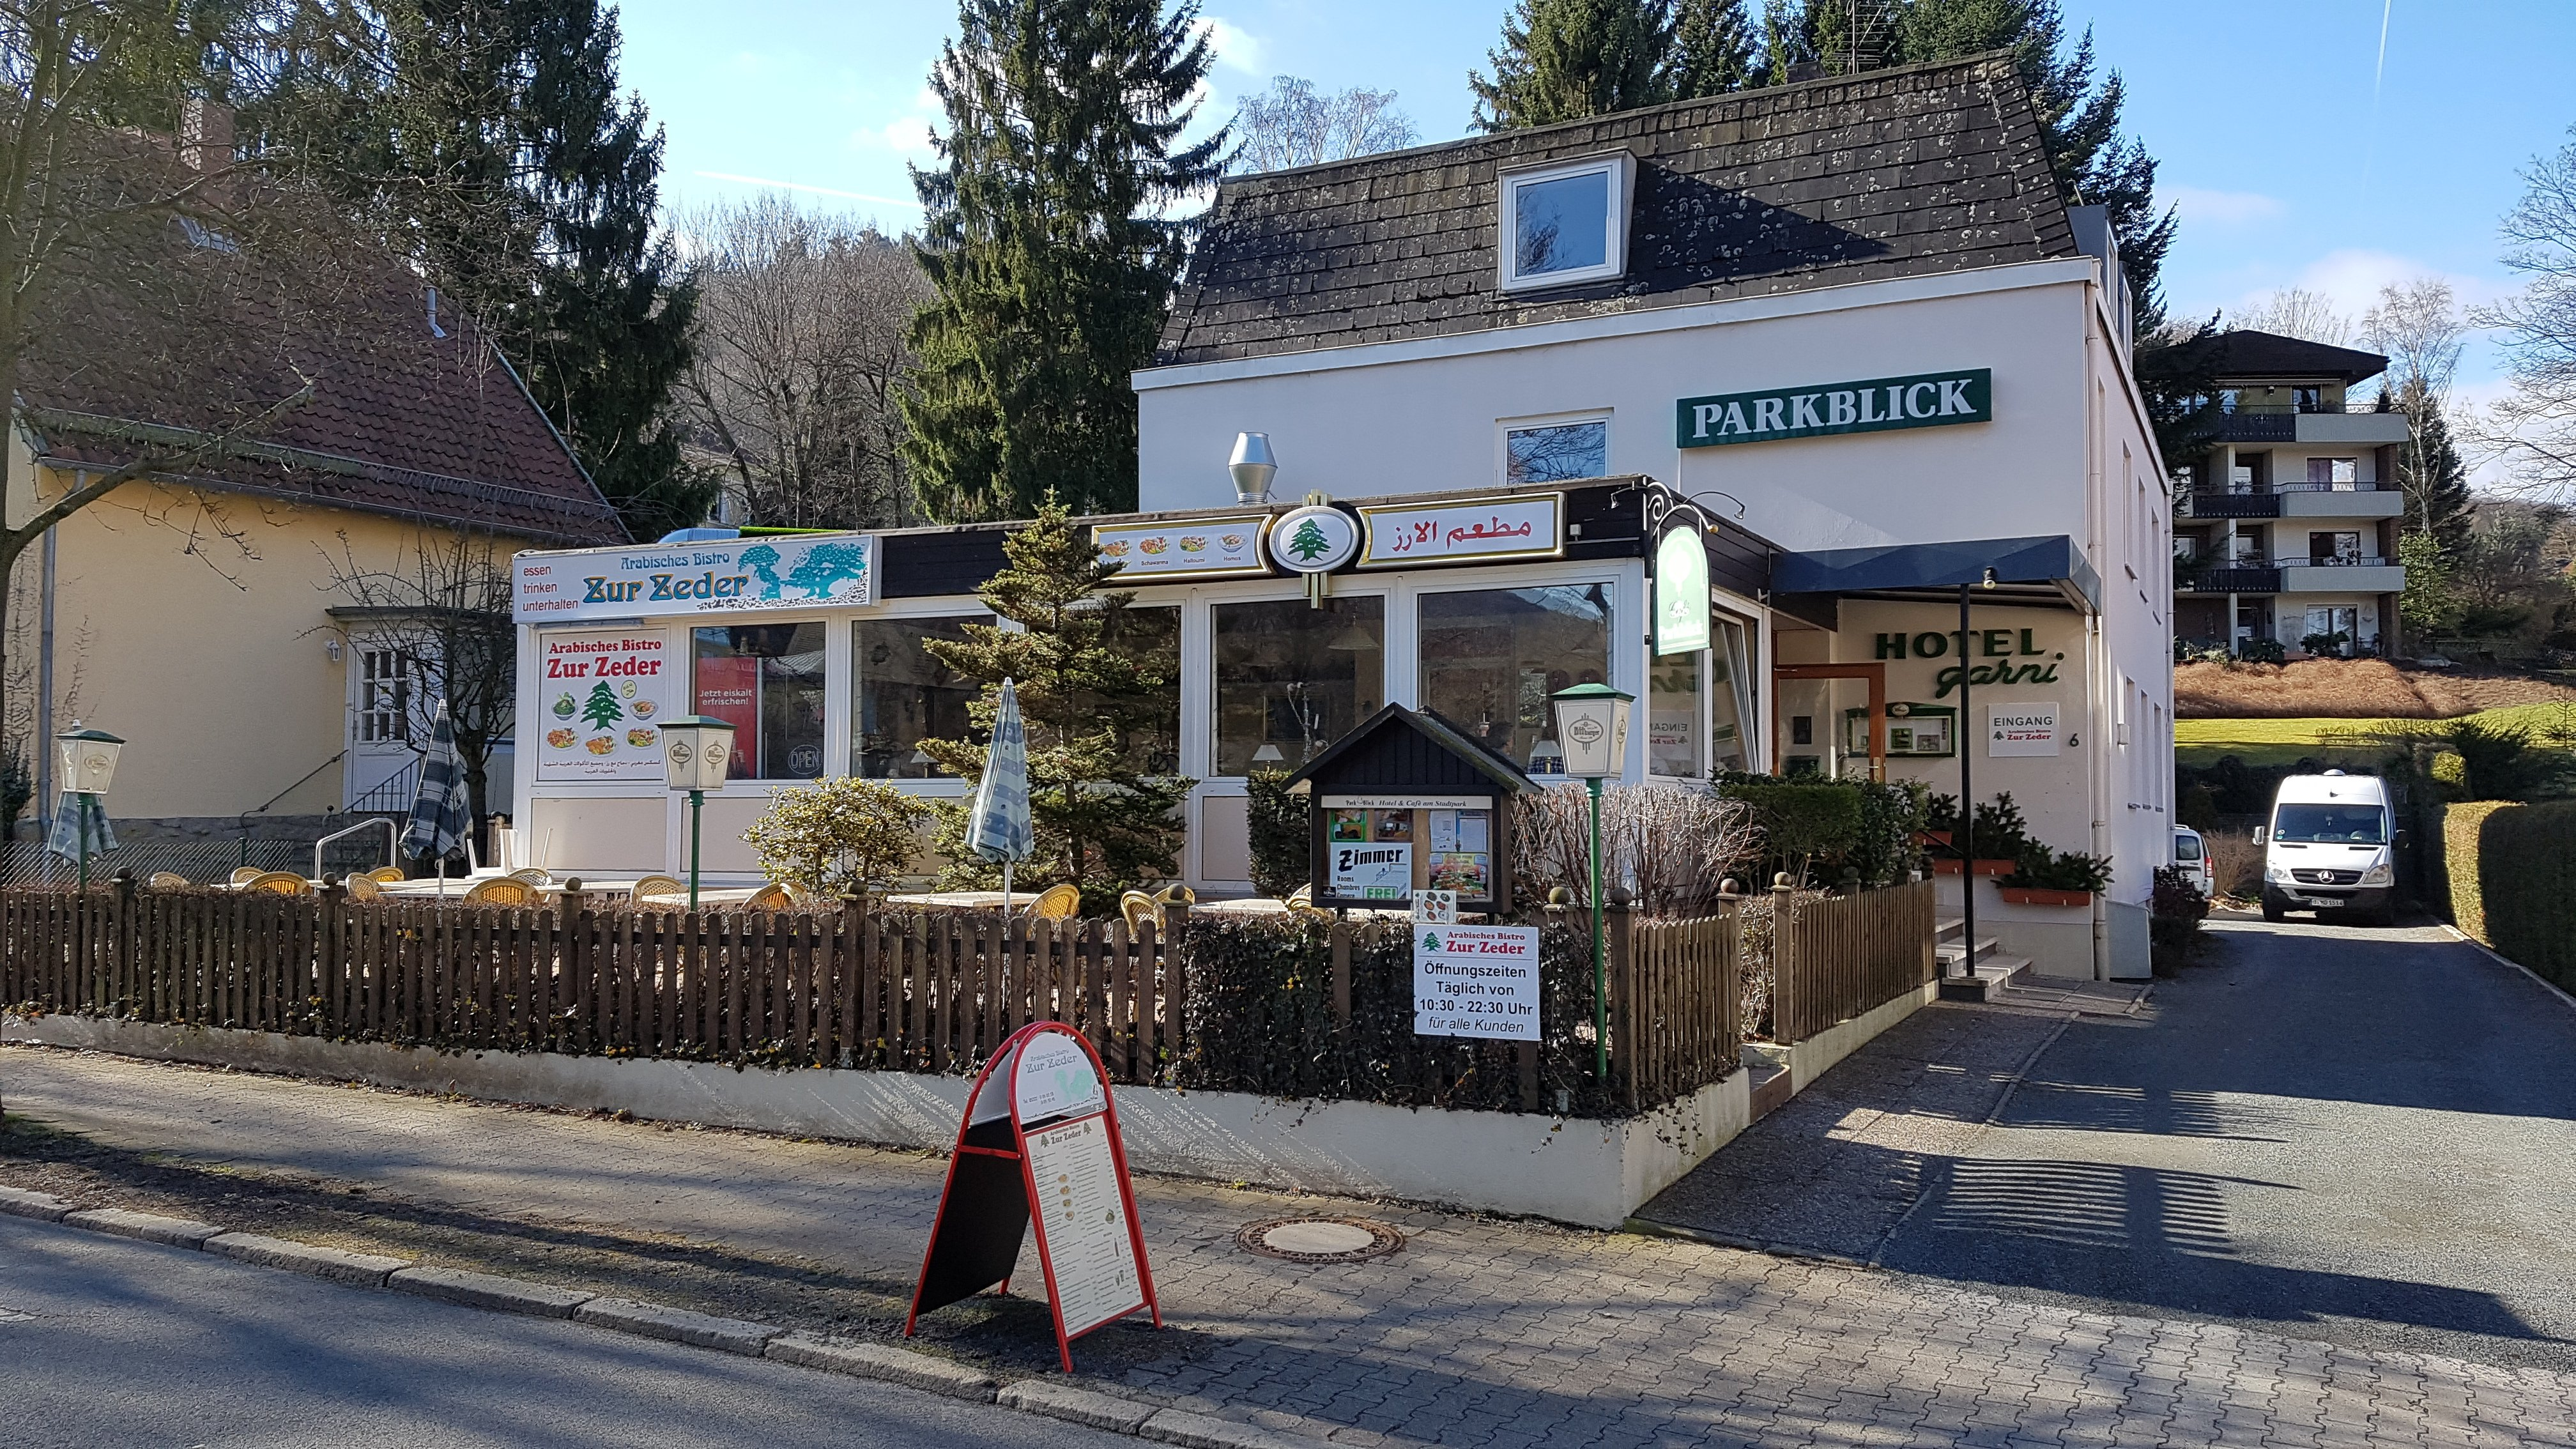 Parkblick Hotel Garni & Cafe